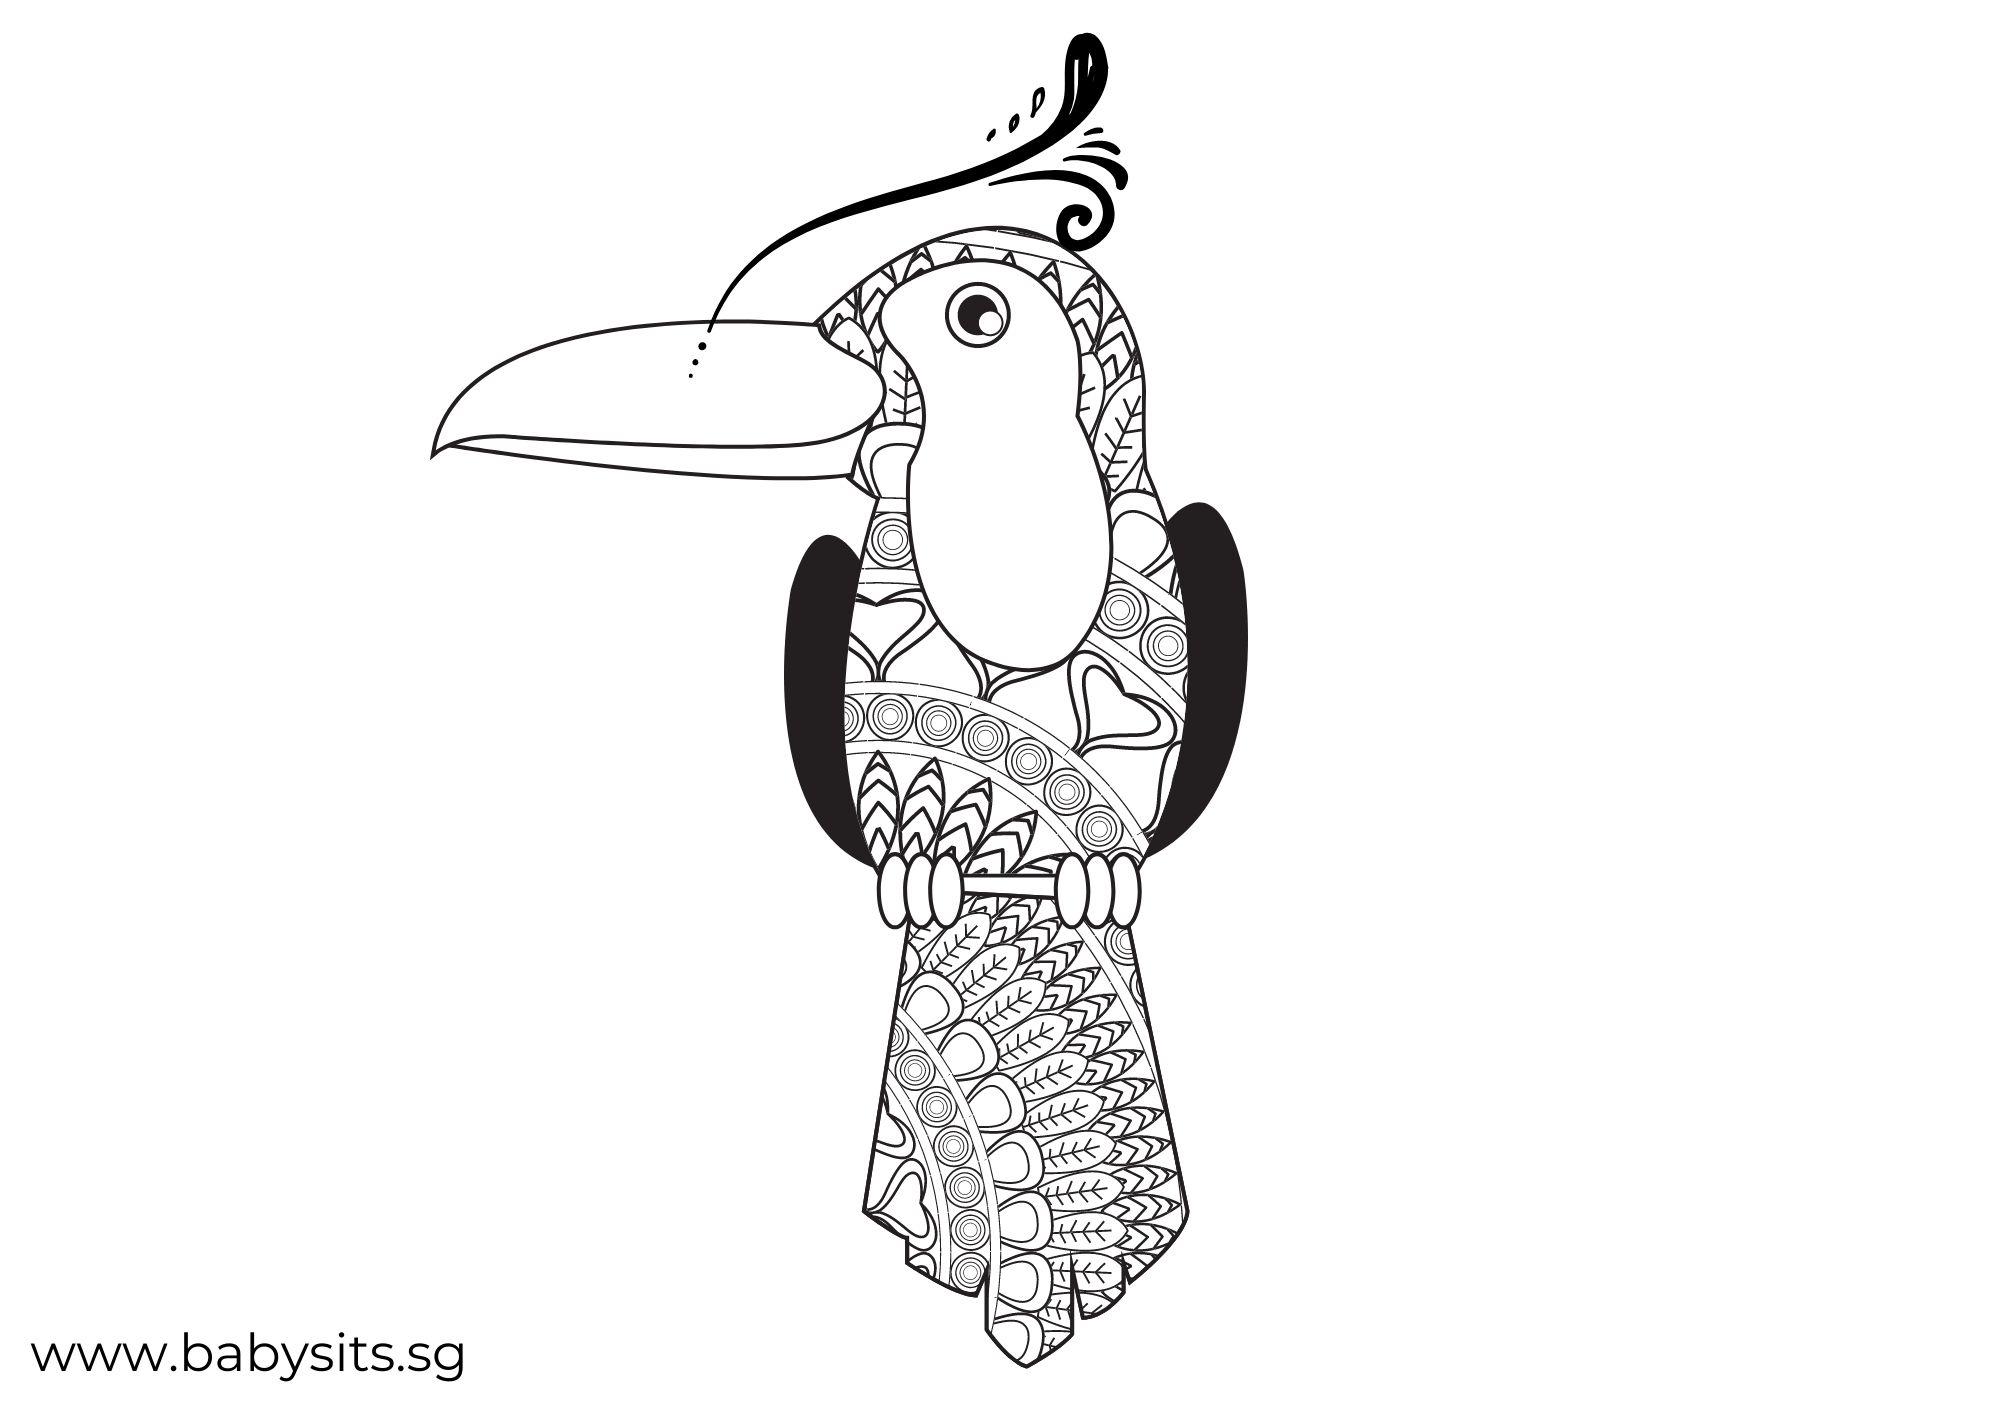 Hornbill bird colouring page